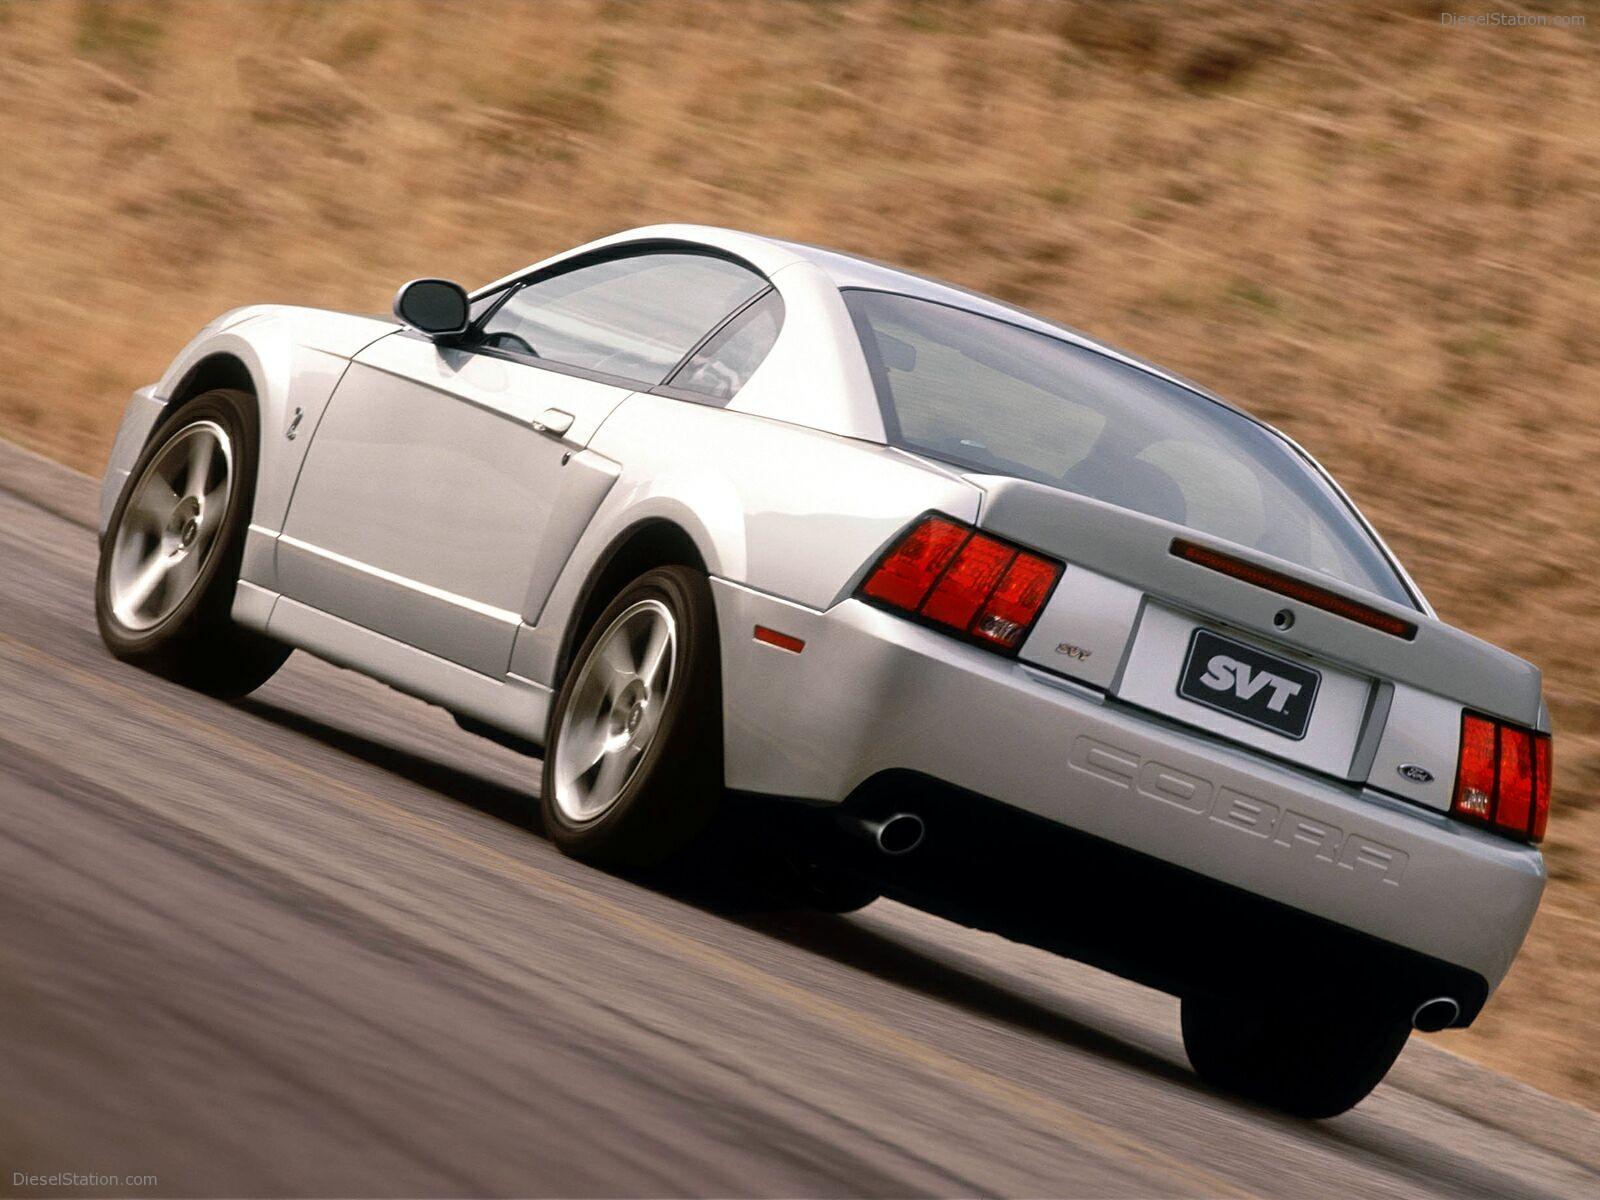 Mustang Terminator Pulley